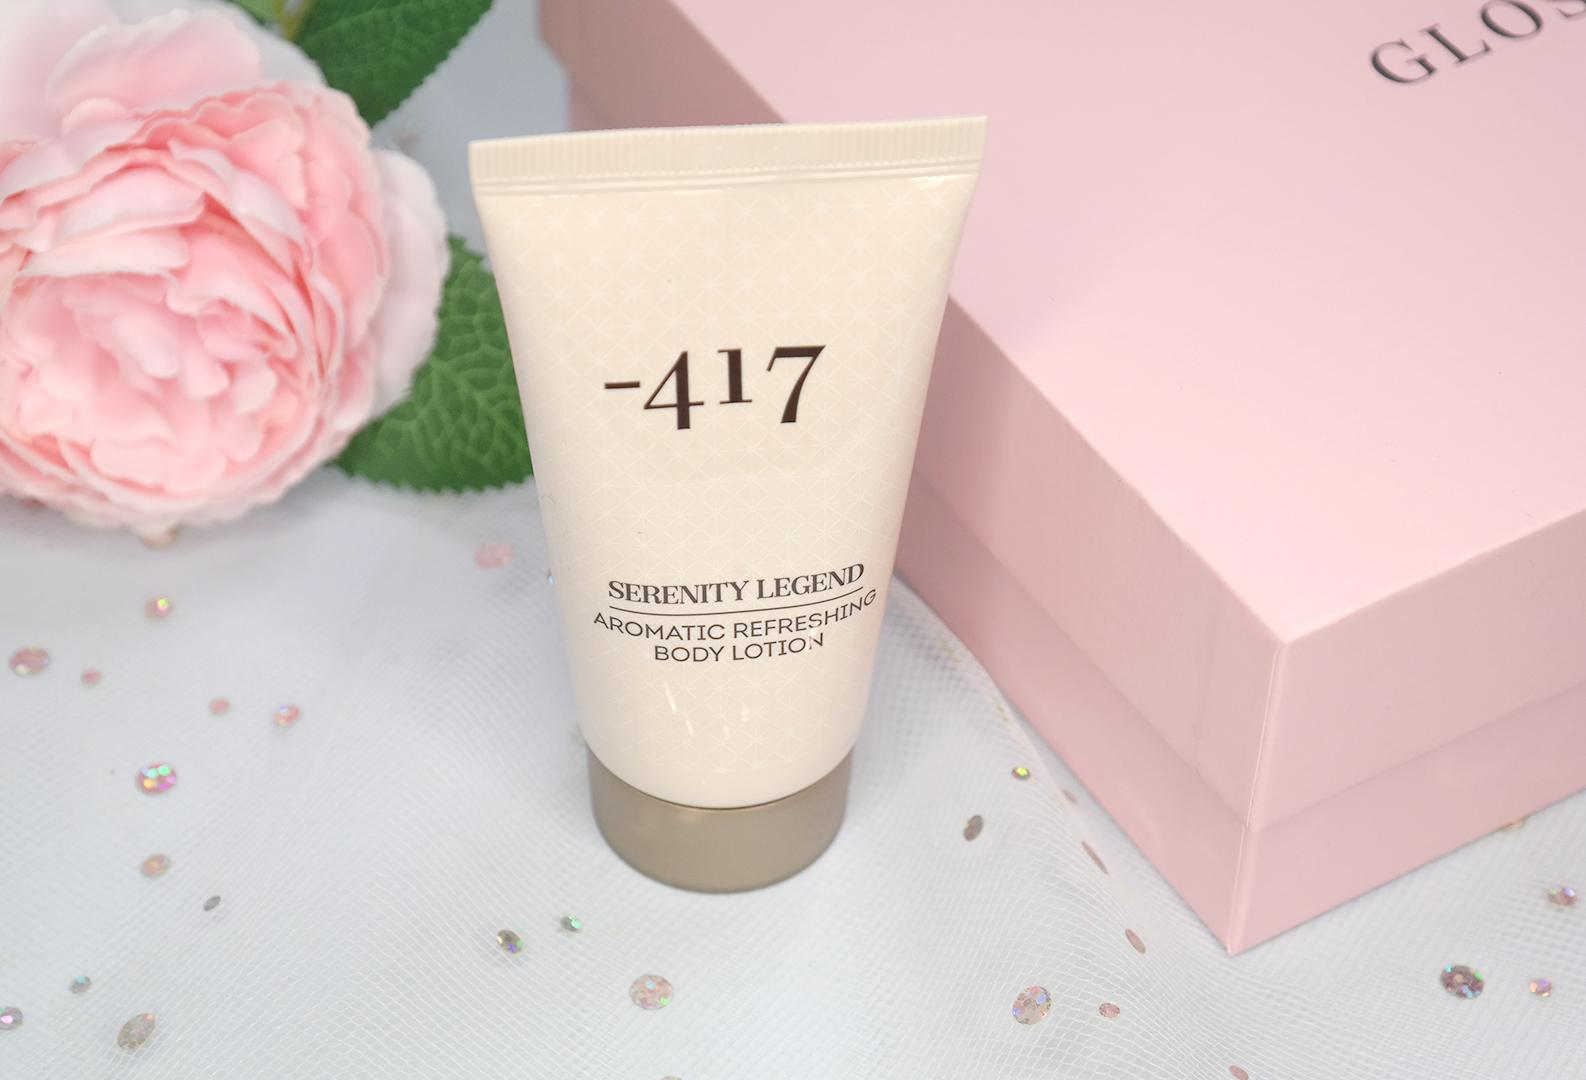 Minus 417 Aromatic Refreshing Body Lotion